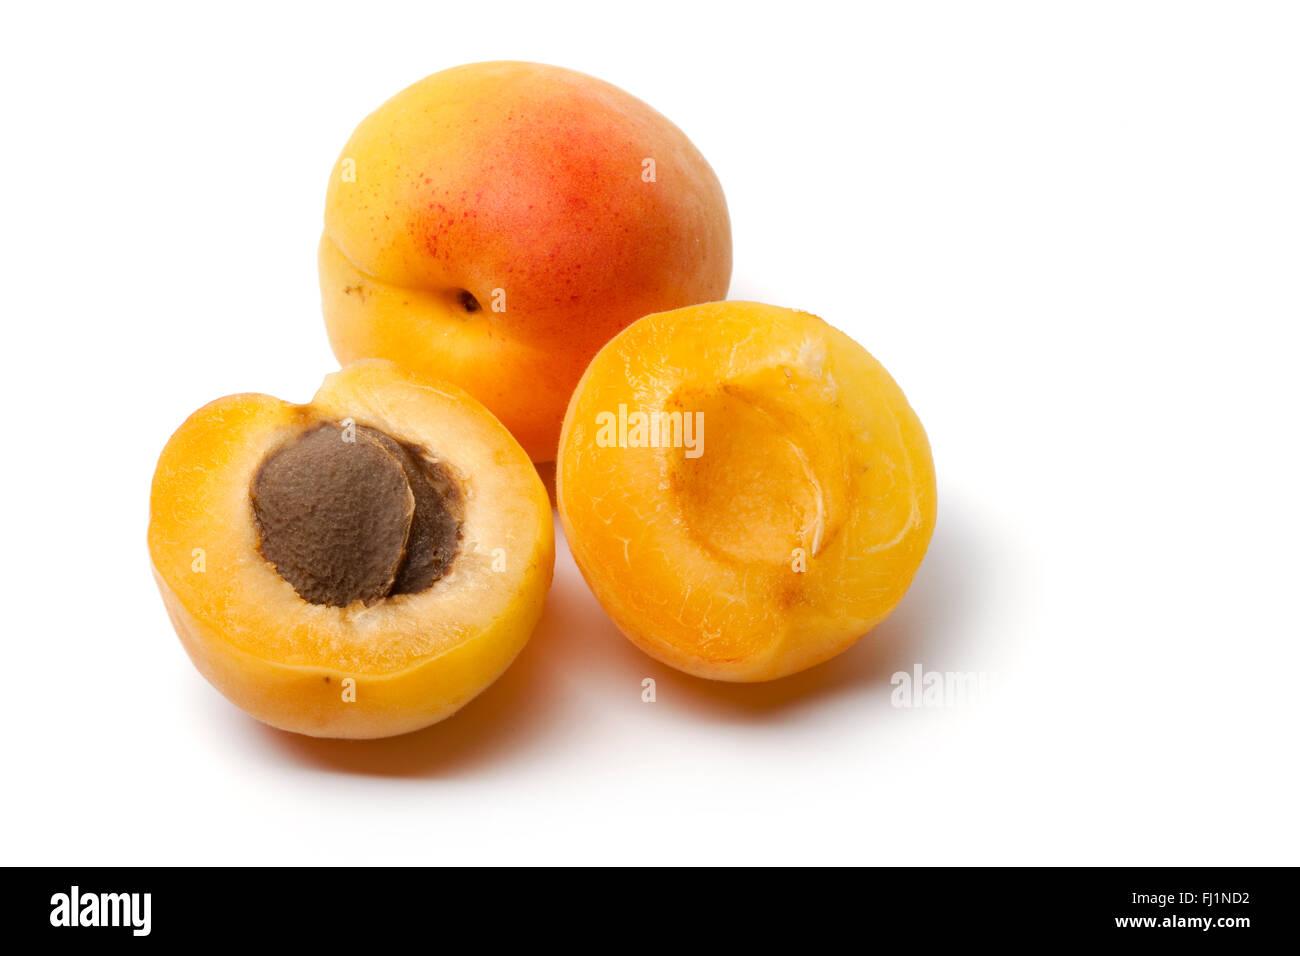 Whole and half fresh apricot isolated on white background - Stock Image